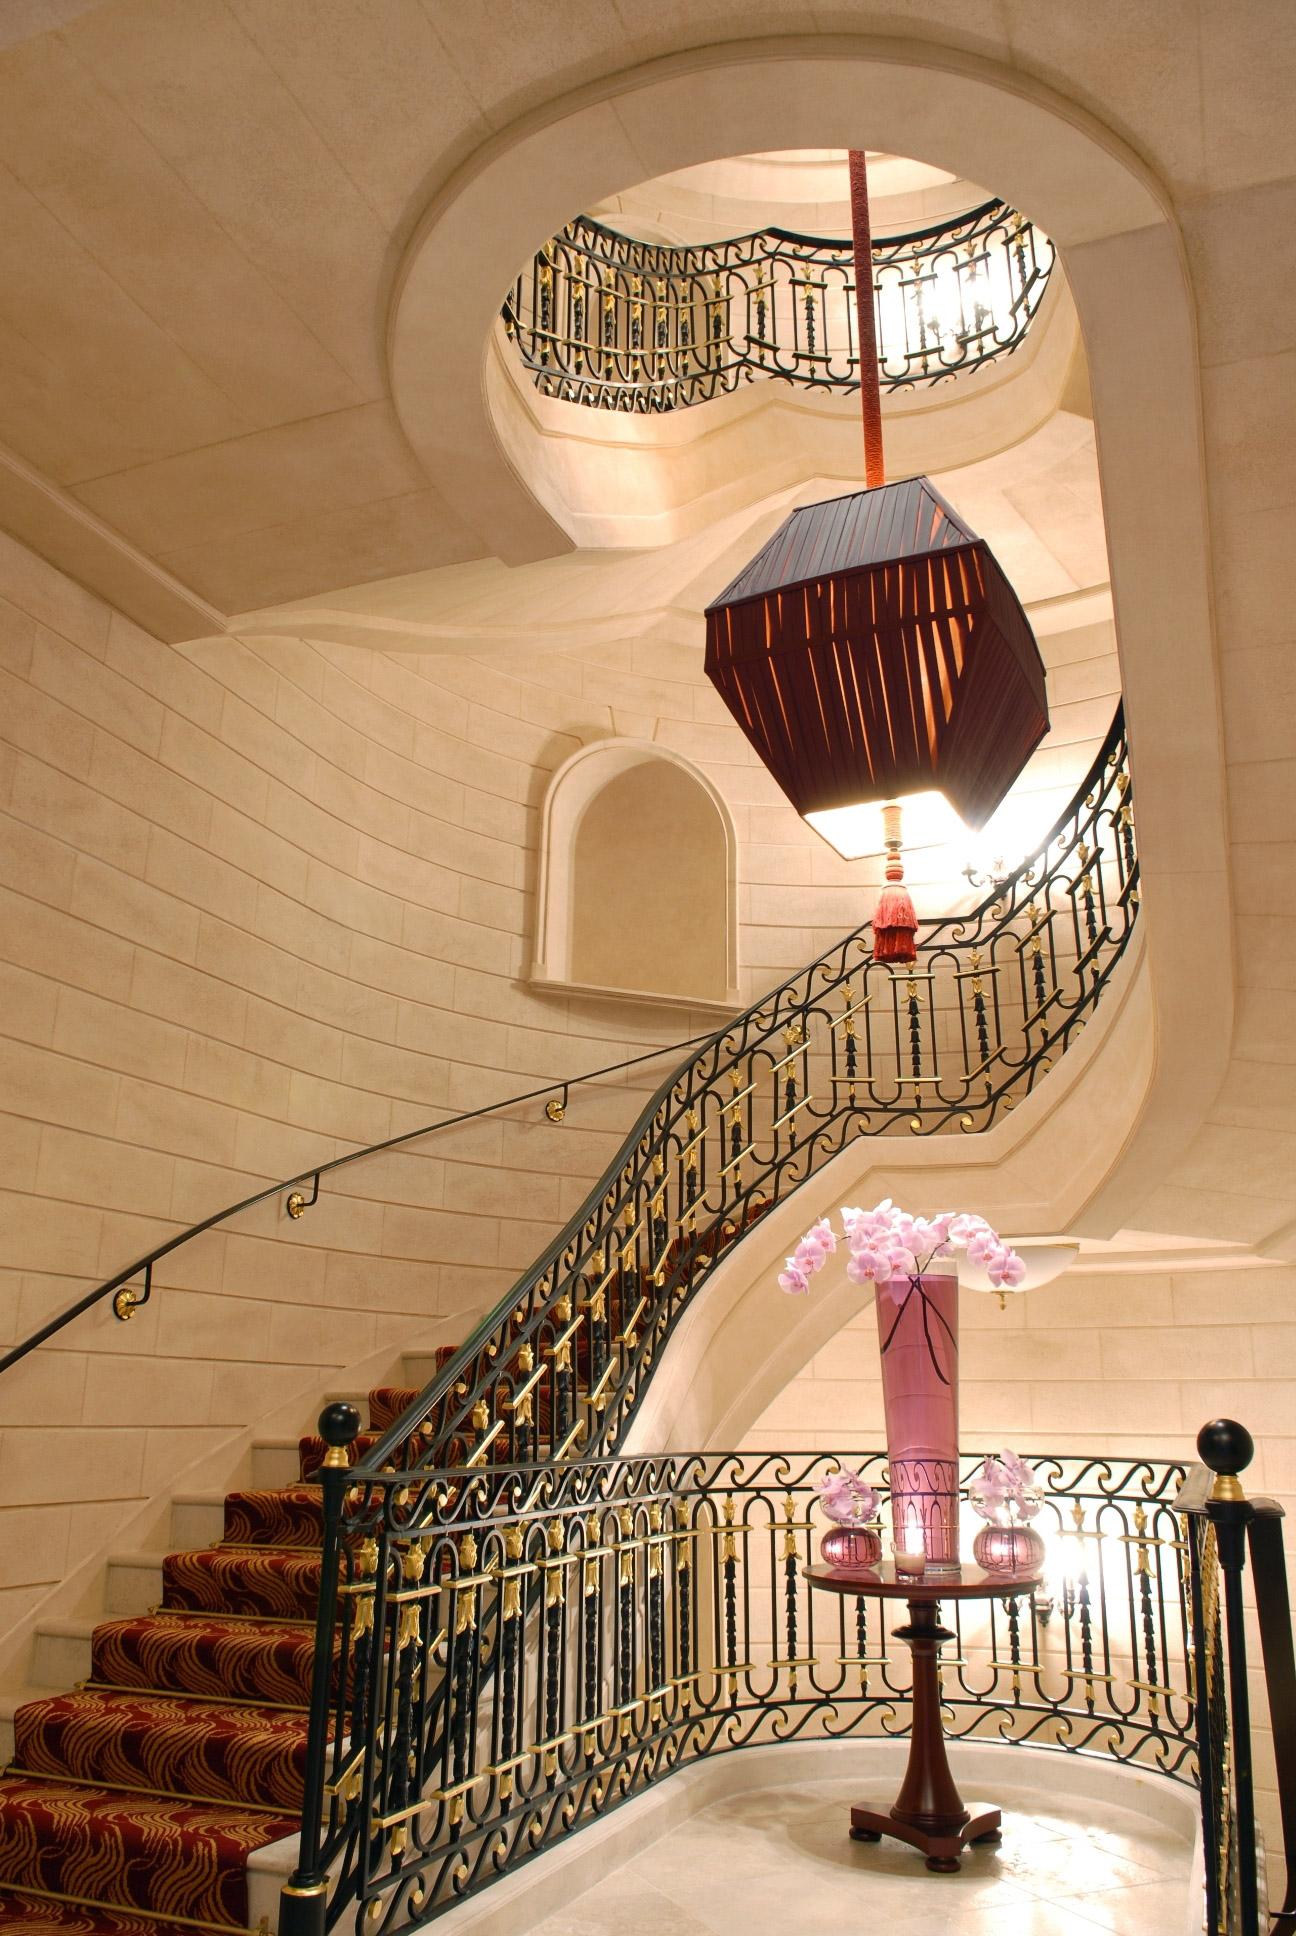 InterContinental Bordeaux Le Grand Hotel - Bordeaux, France - Grand Staircase